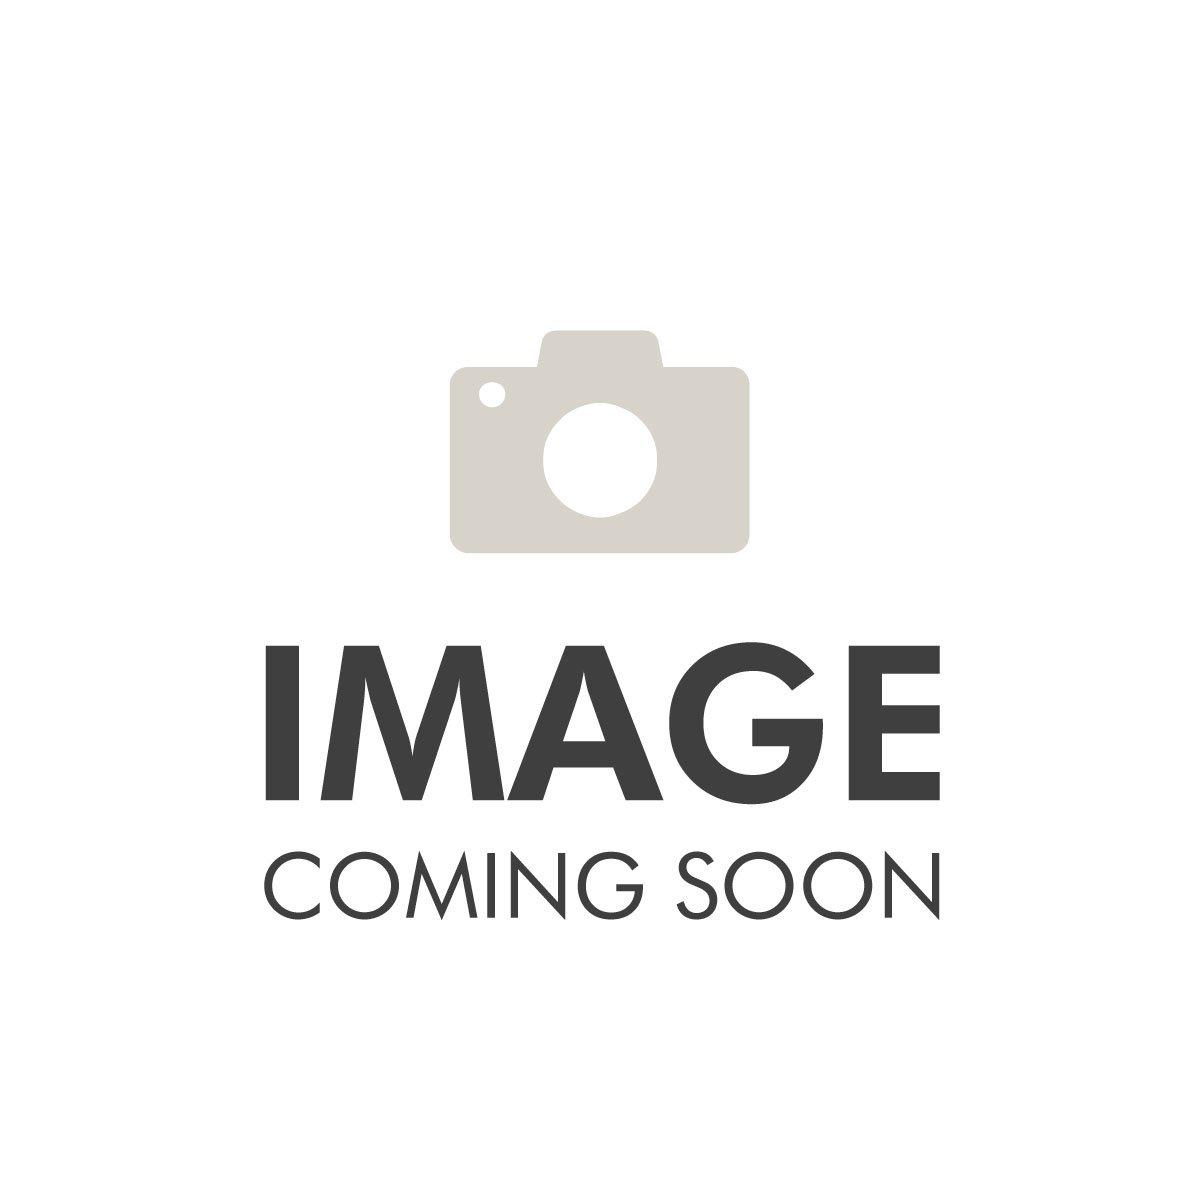 Lancome Tresor Midnight Rose EDP Spray 30ml